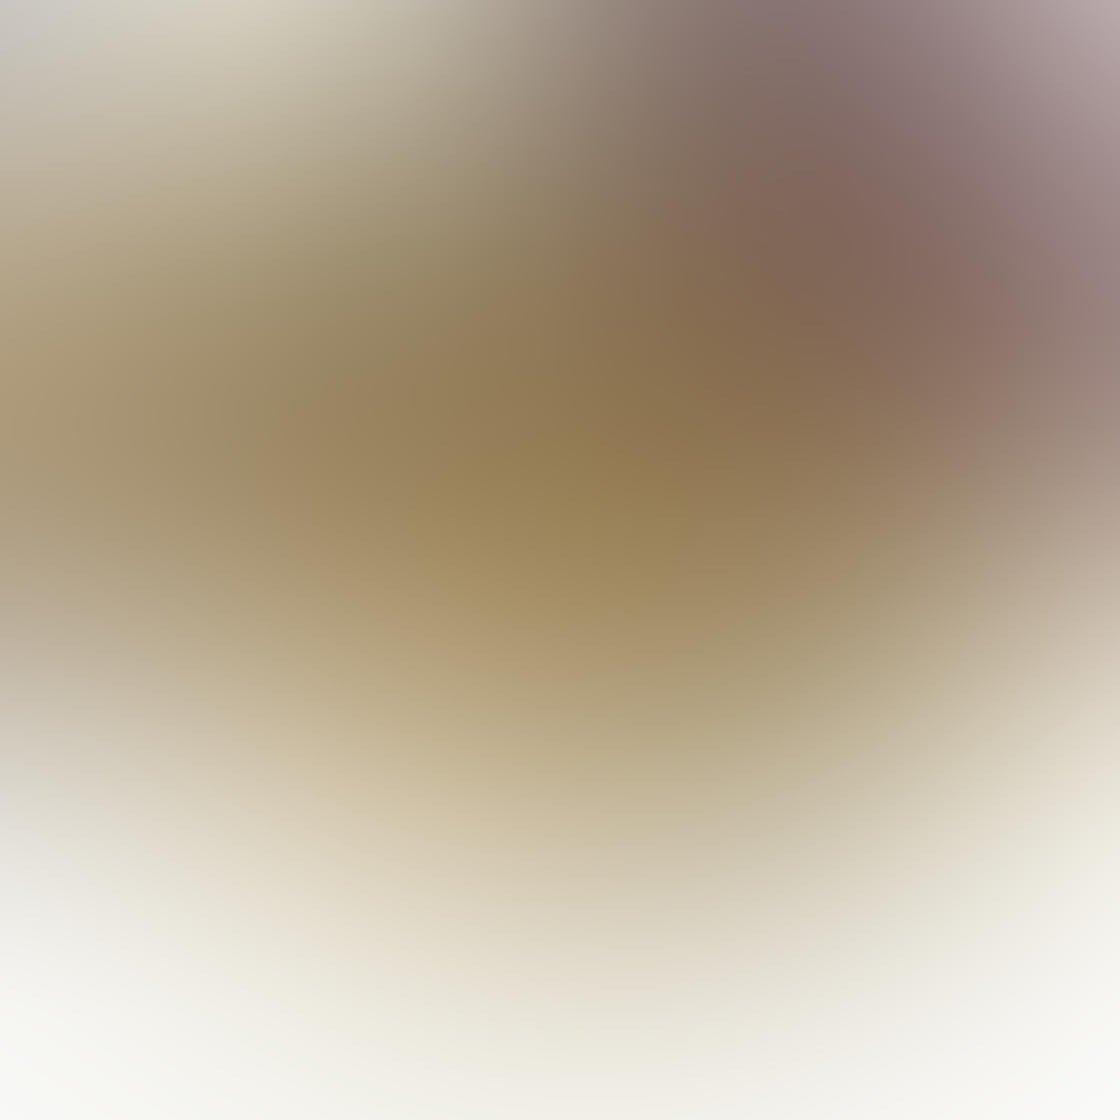 iPhone Photo Vignette 13